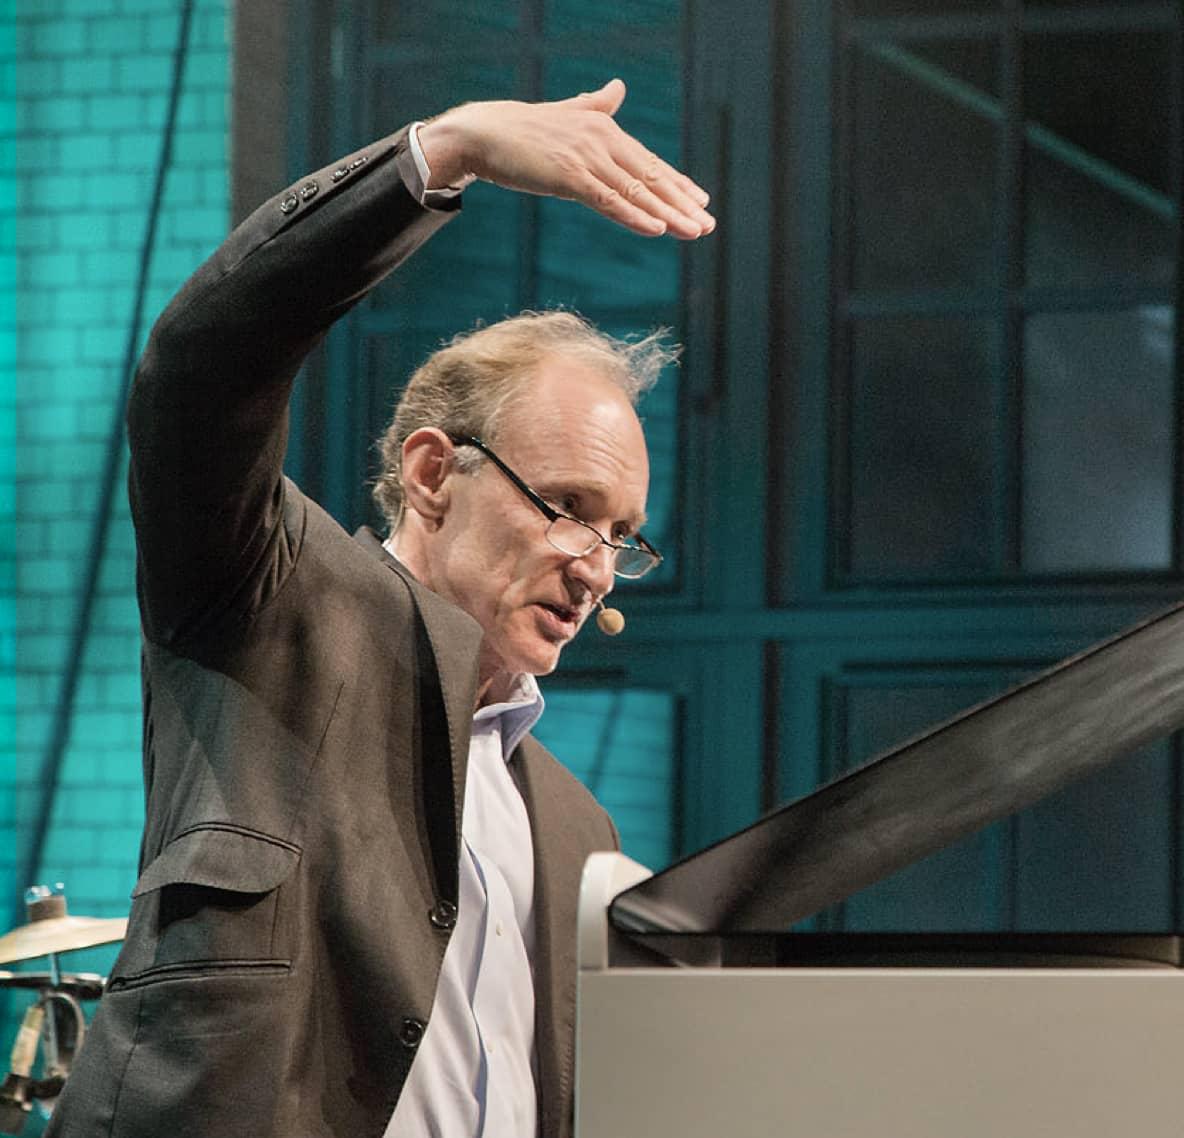 Kenza creation launch event of Hewlett-Packard Enterprise EMEA immersive brand and customer experience speaker Sir Tim Berners Lee